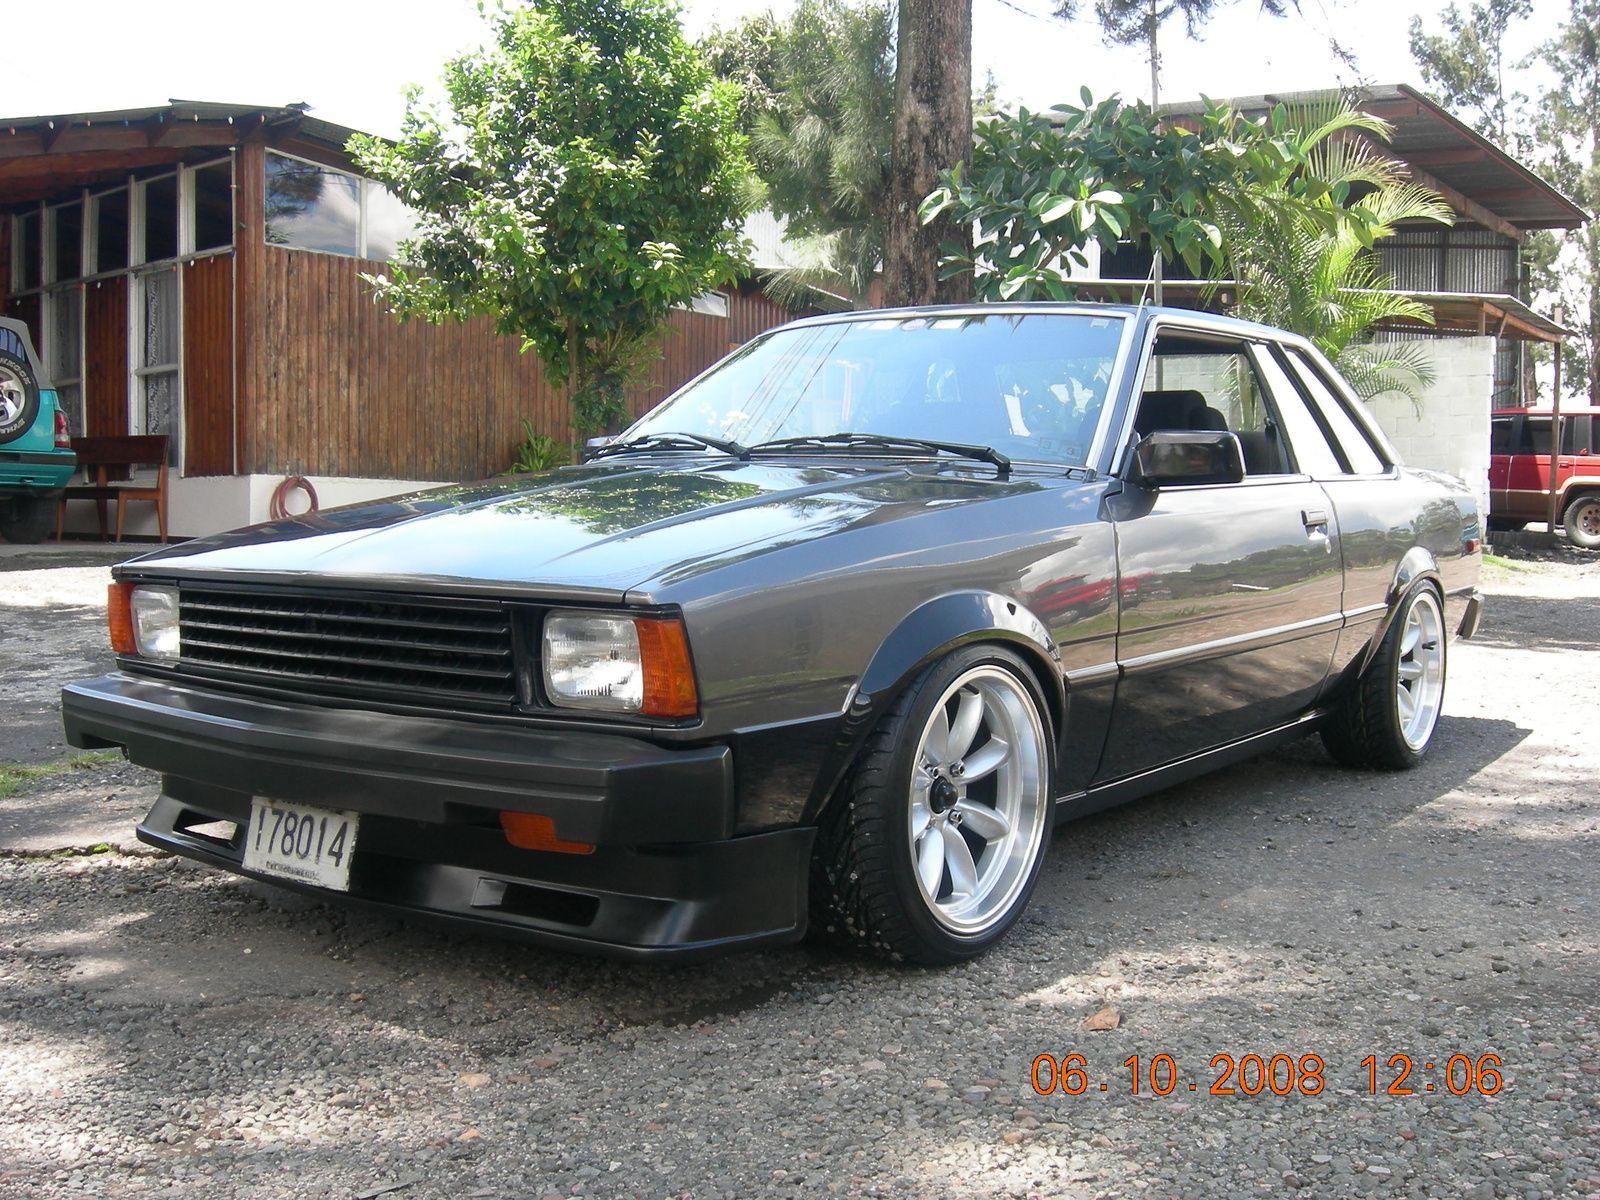 1982 Toyota Corolla Sr5 Coupe